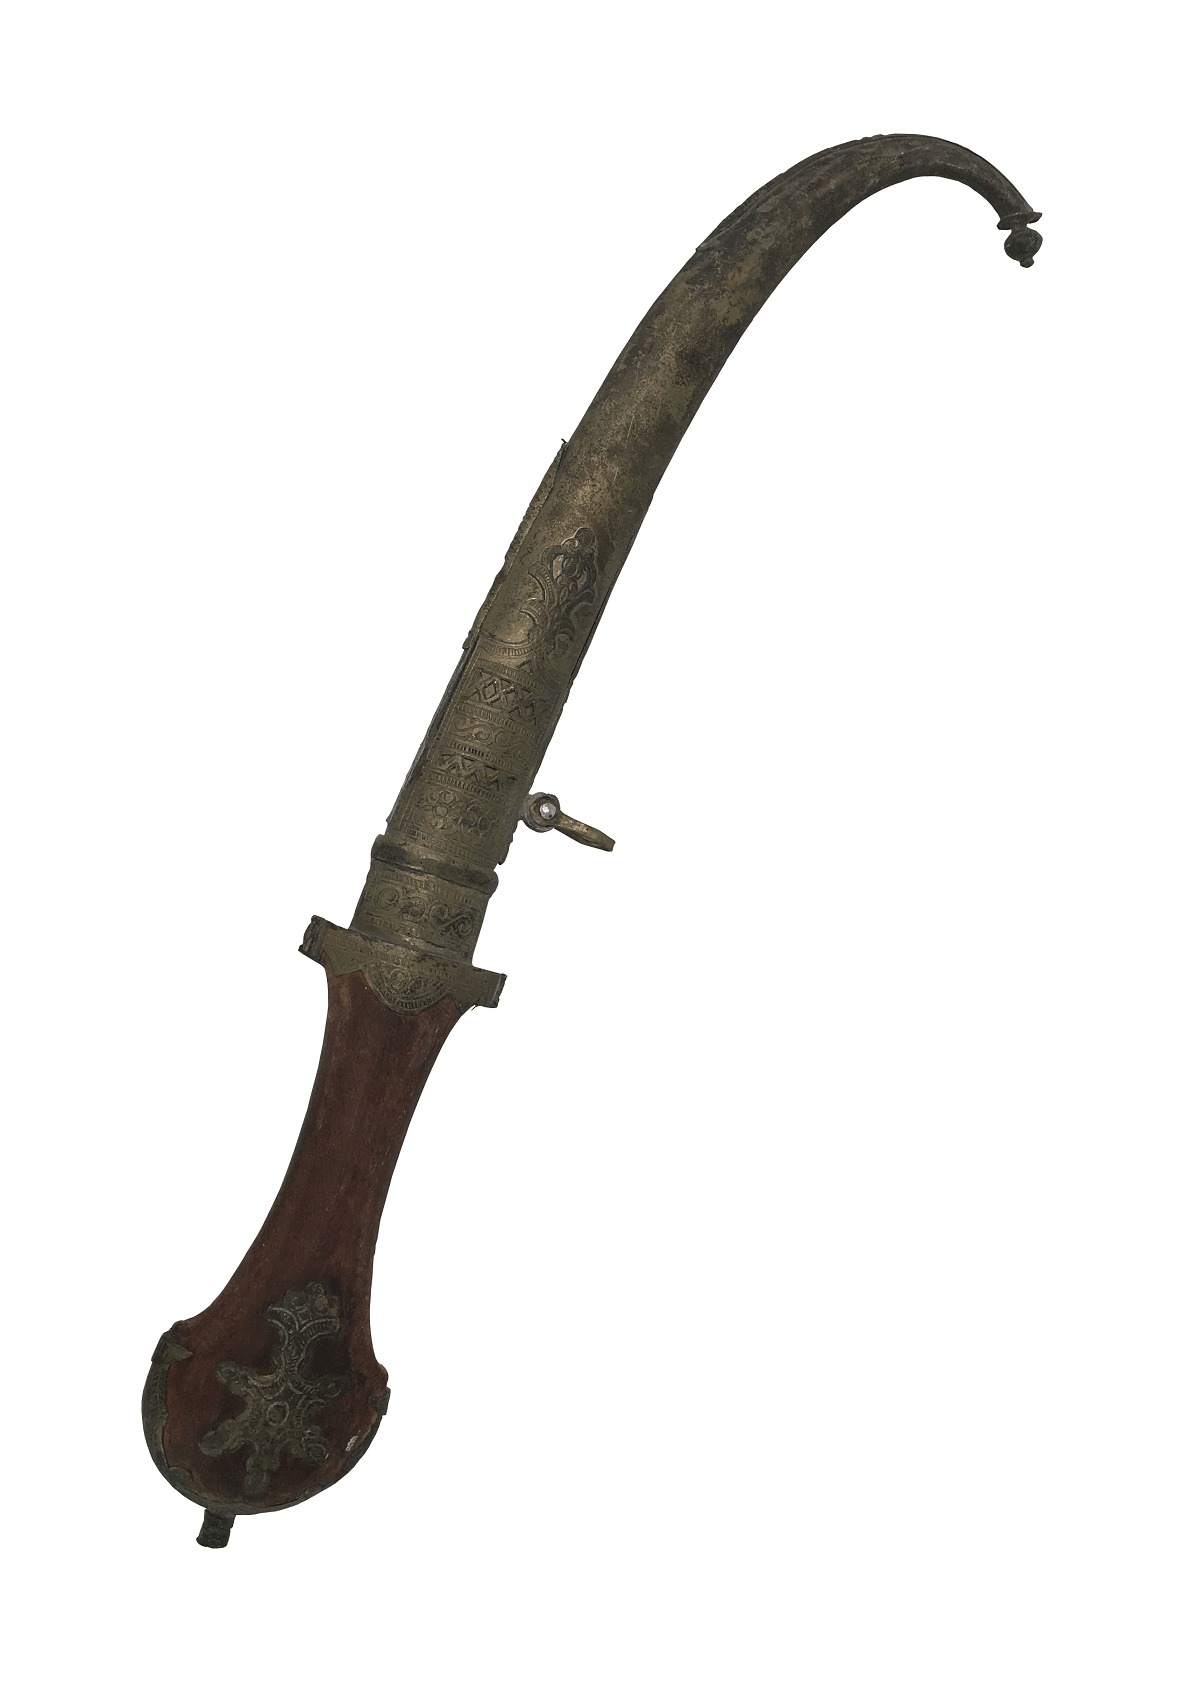 Antigo Punhal Indiano Ou Turco Metal E Madeira 43cm